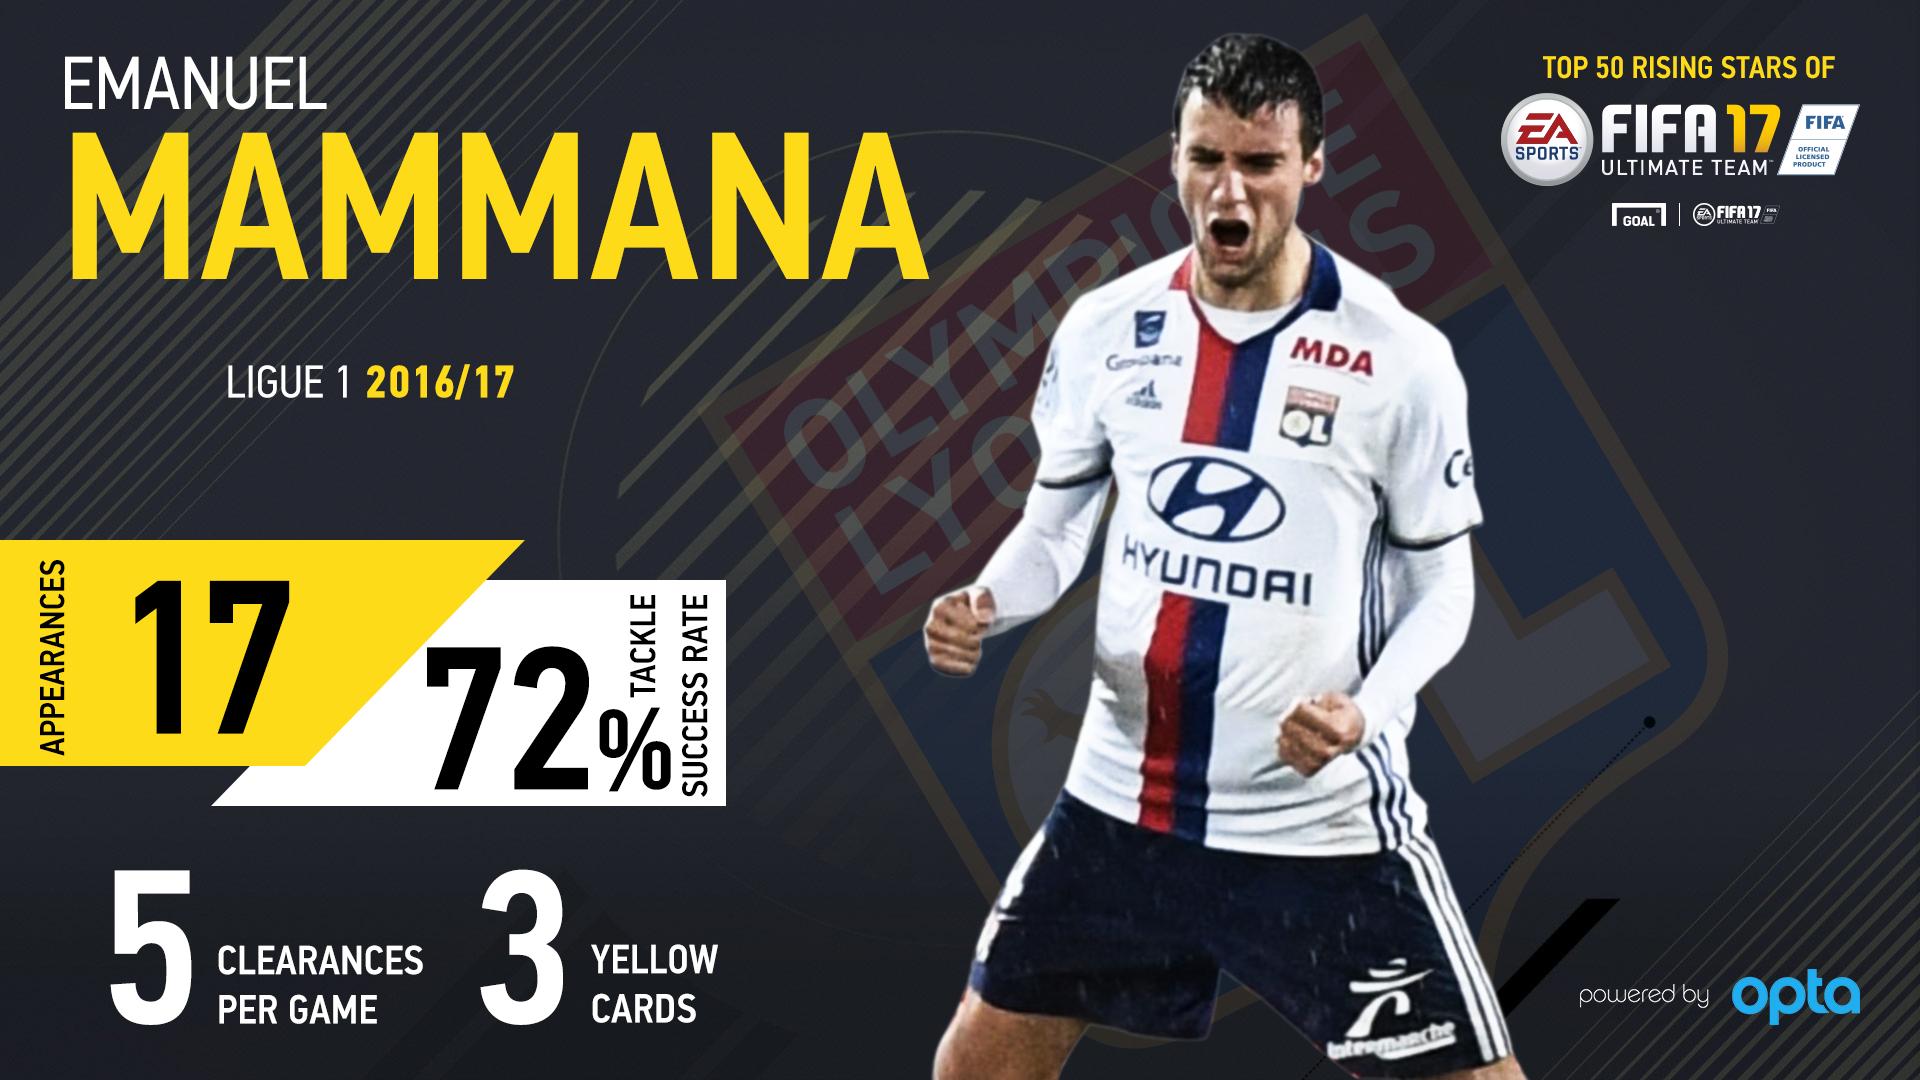 Emanuel Mammana FUT Rising Star